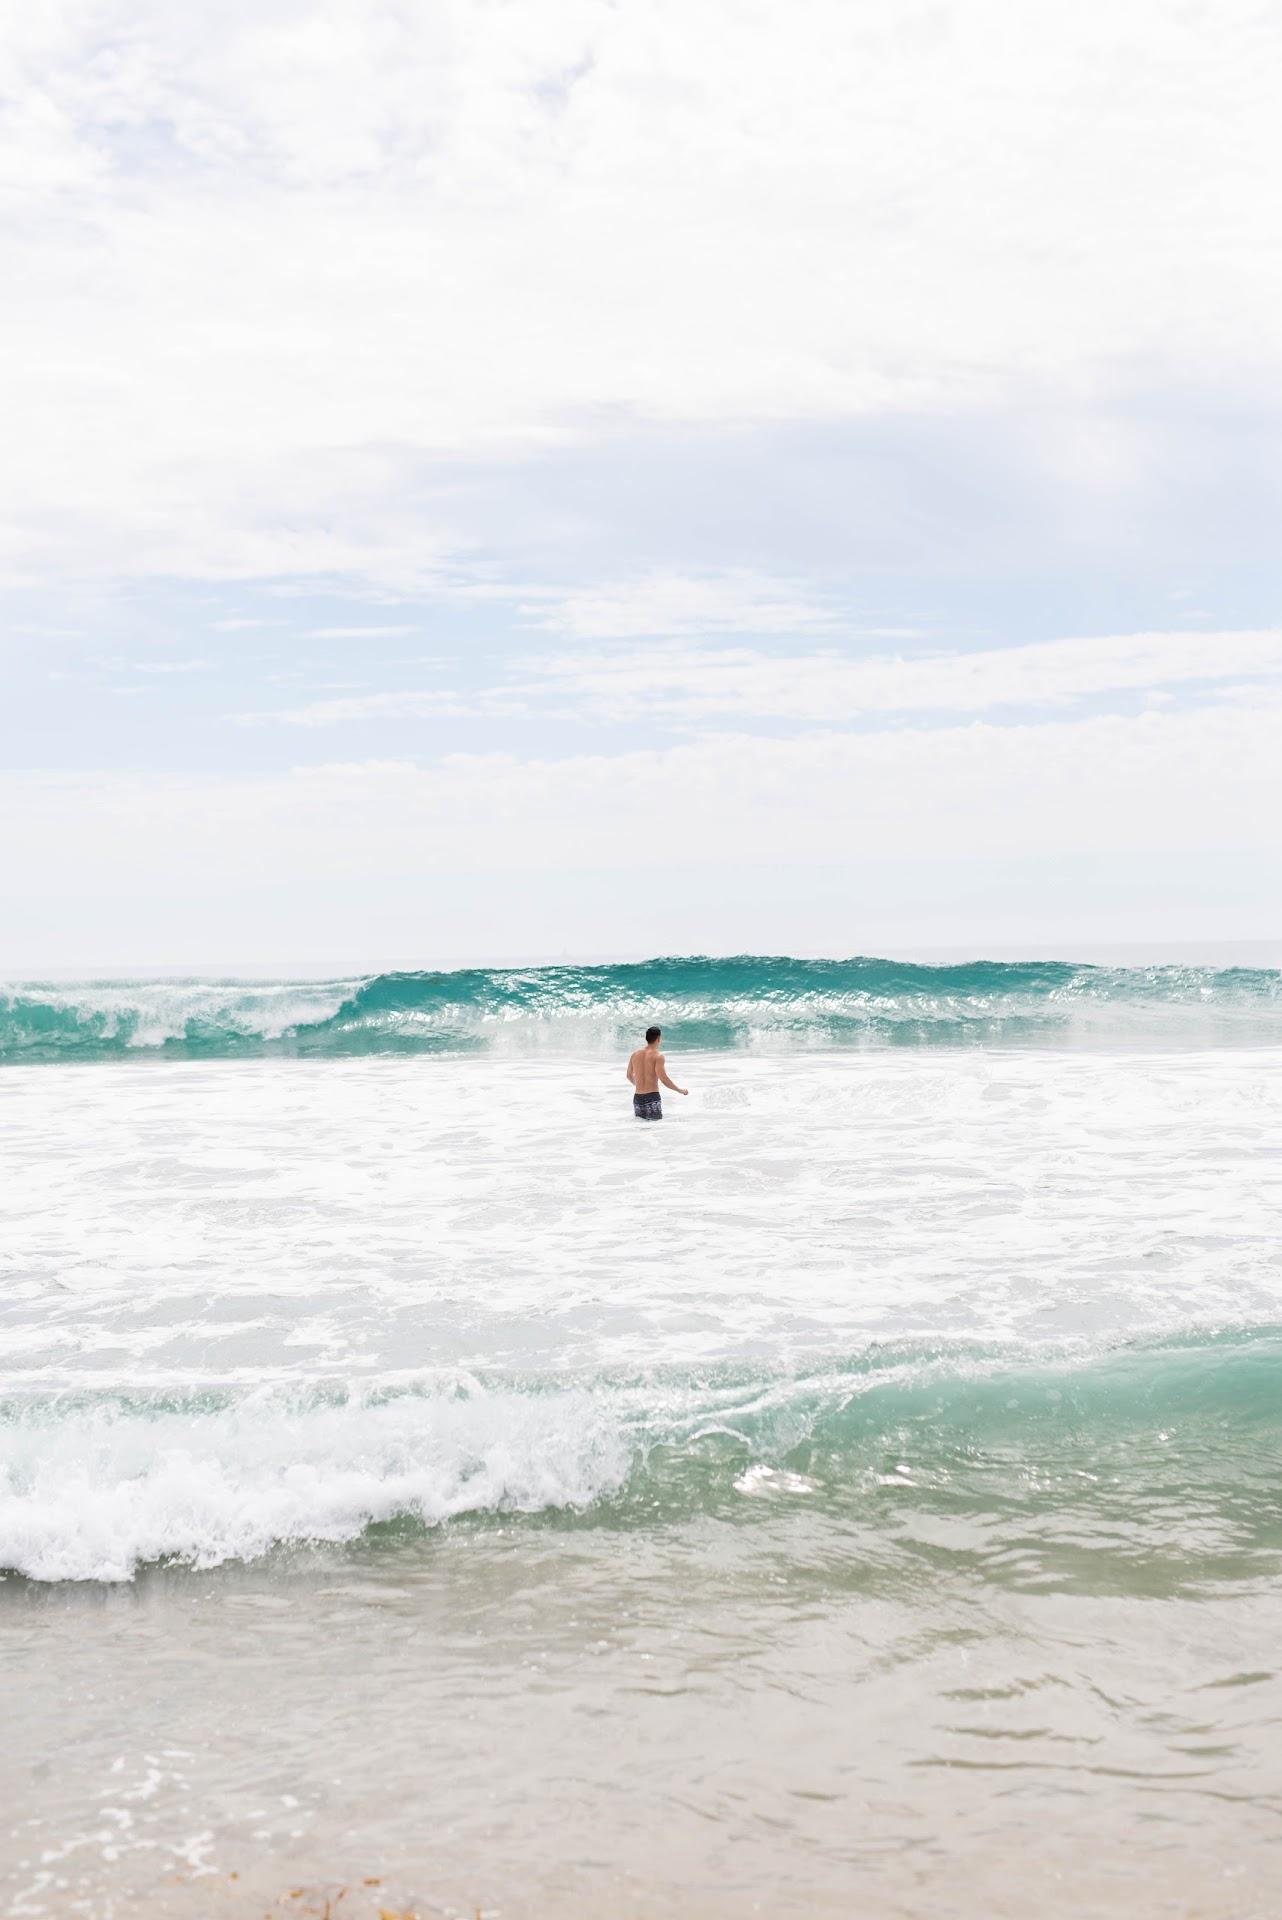 newport beach, venice beach, southern california best beaches, cali blogger, travel, lds mormon